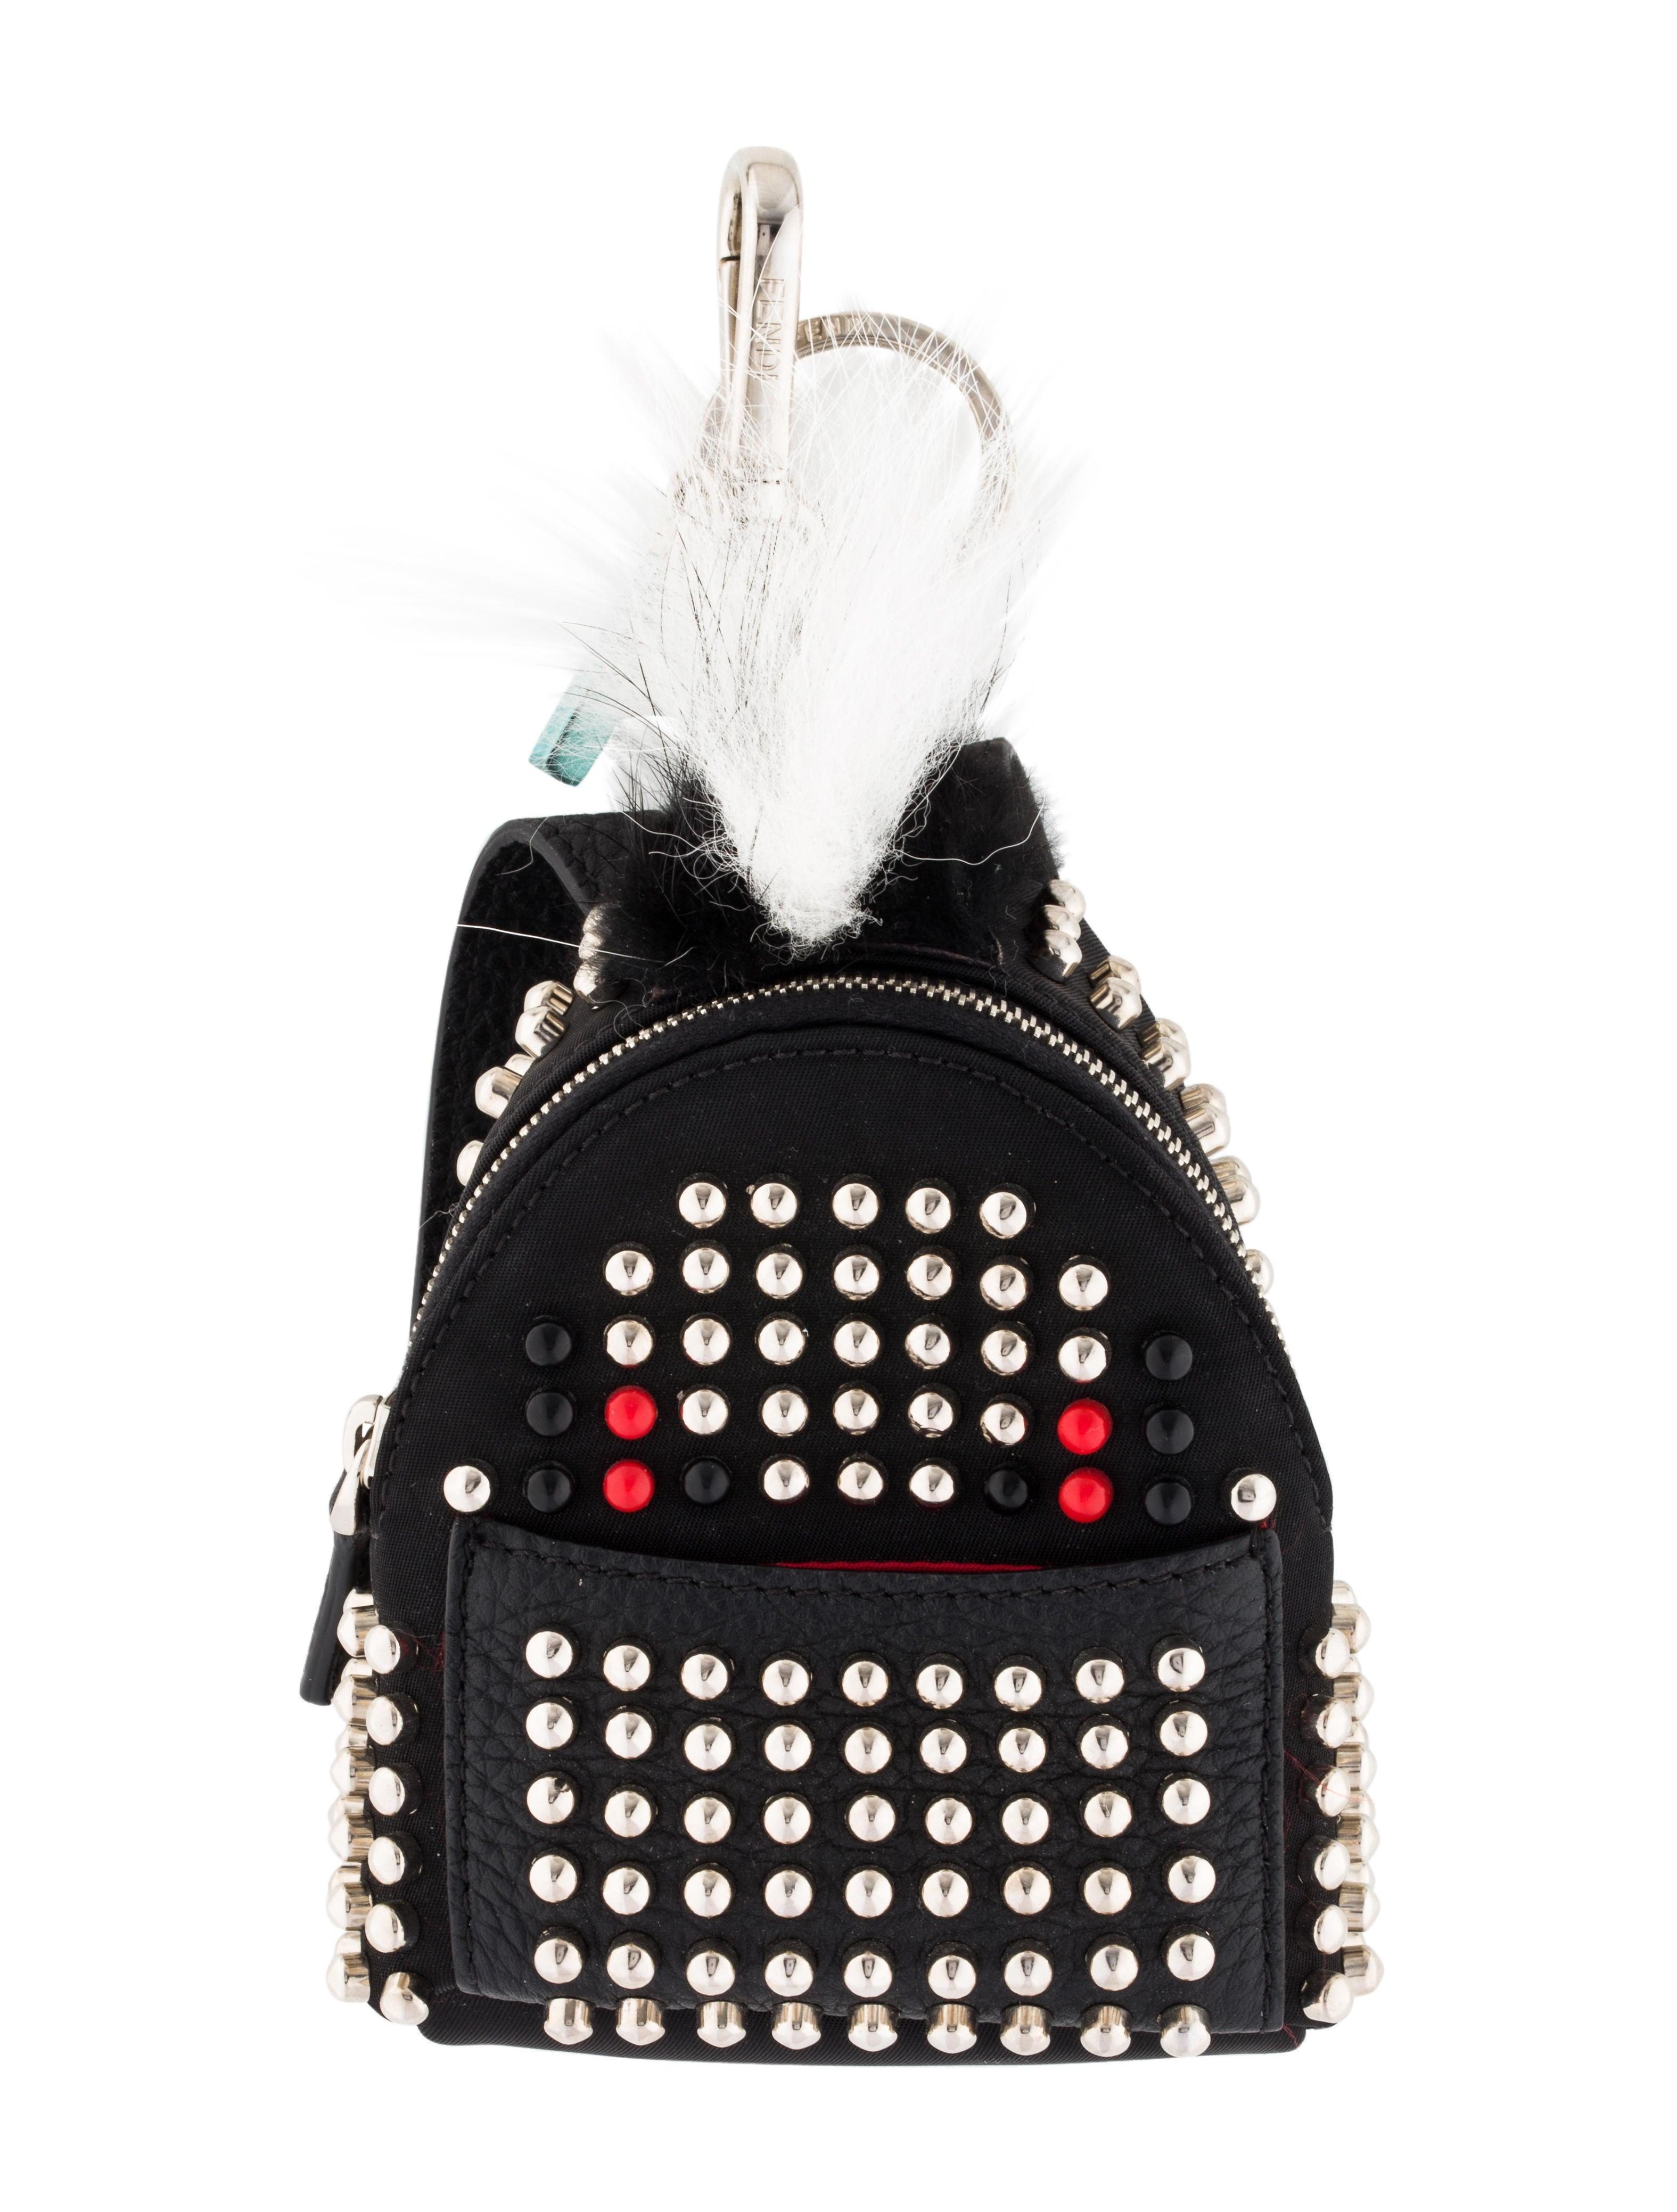 730698229024 Fendi Fur Studded Backpack Monster Bag Bug Charm - Accessories ...